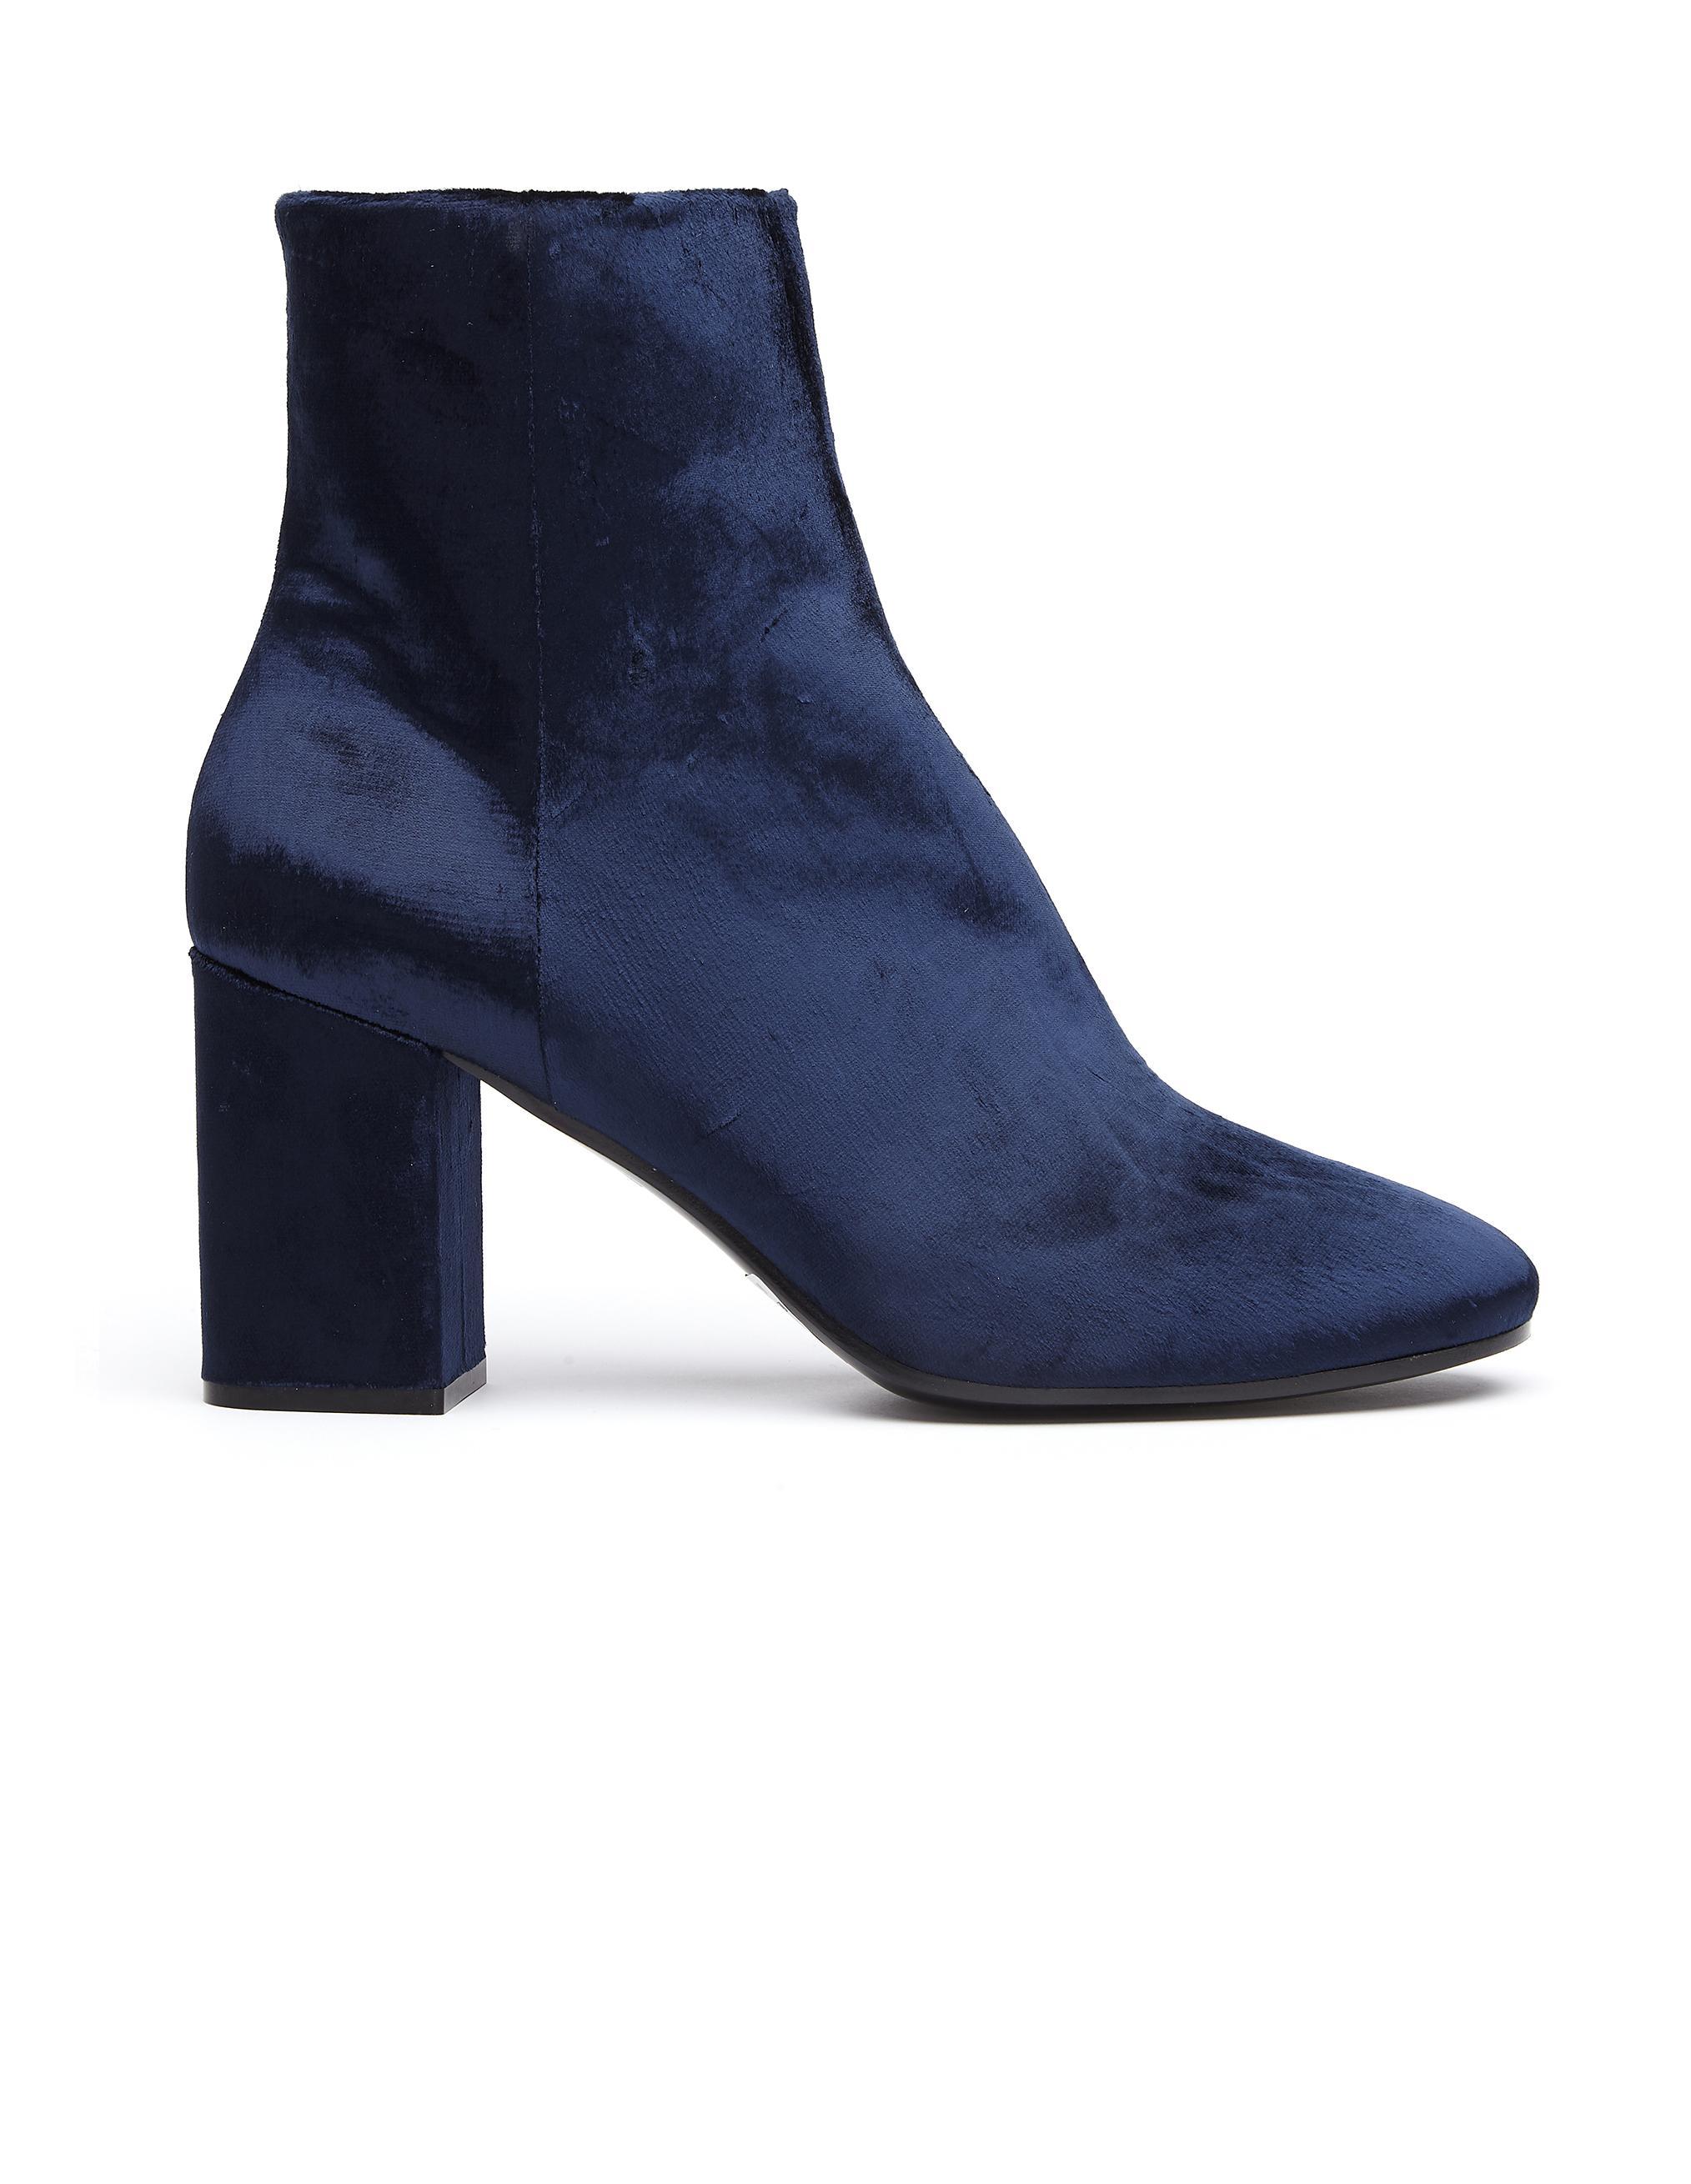 Lyst Balenciaga Velvet Ankle Boots In Blue